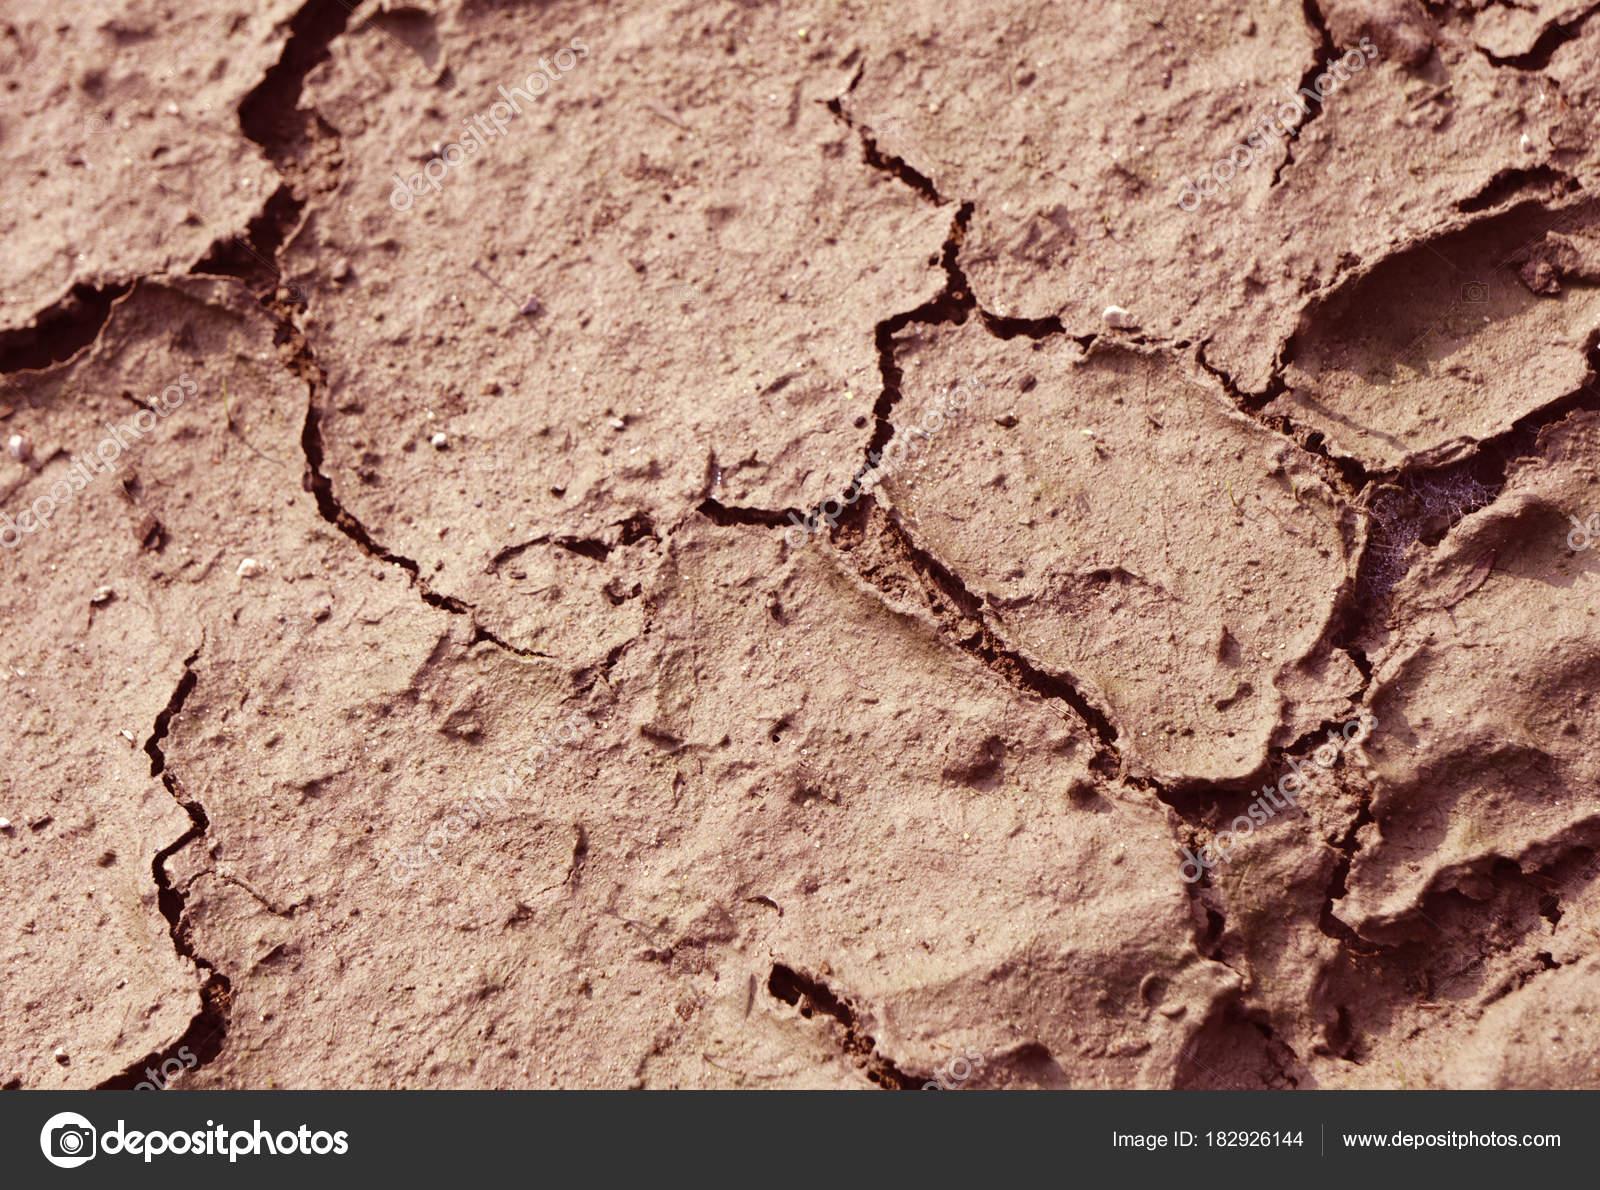 Kleine Risse Bodentexturen Stockfoto C Baon85 182926144